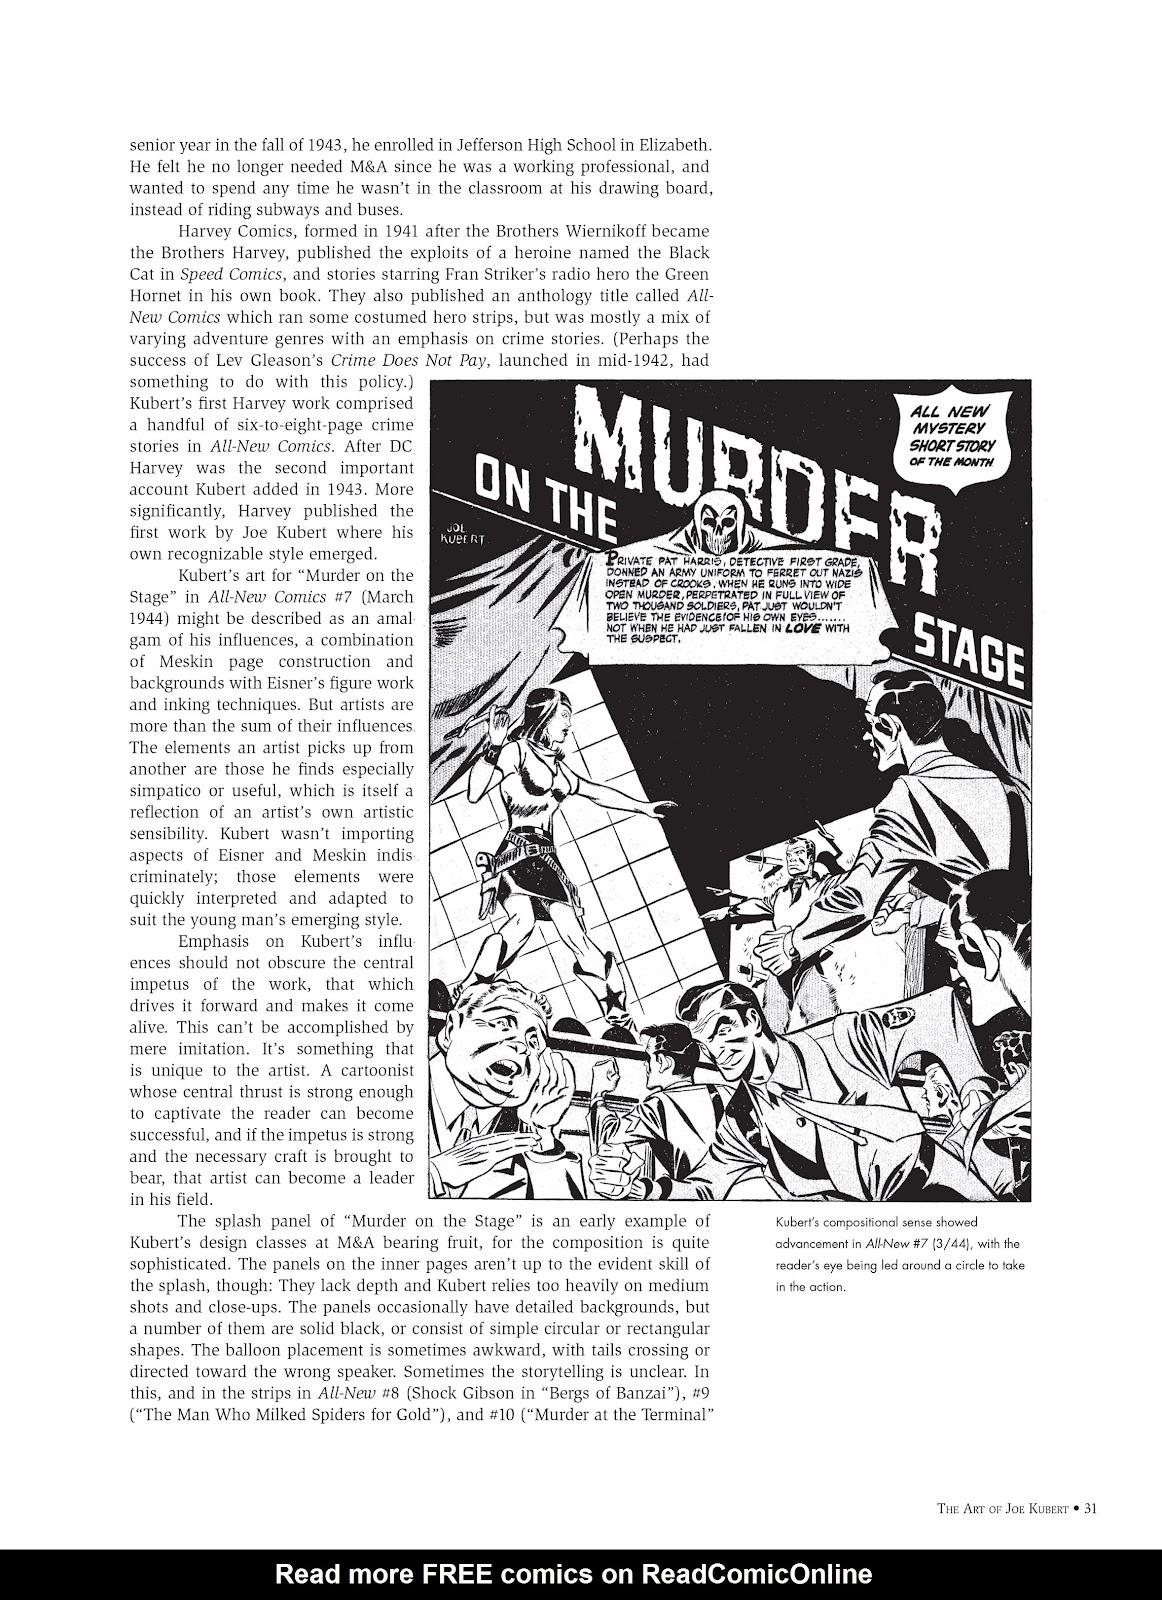 Read online The Art of Joe Kubert comic -  Issue # TPB (Part 1) - 30